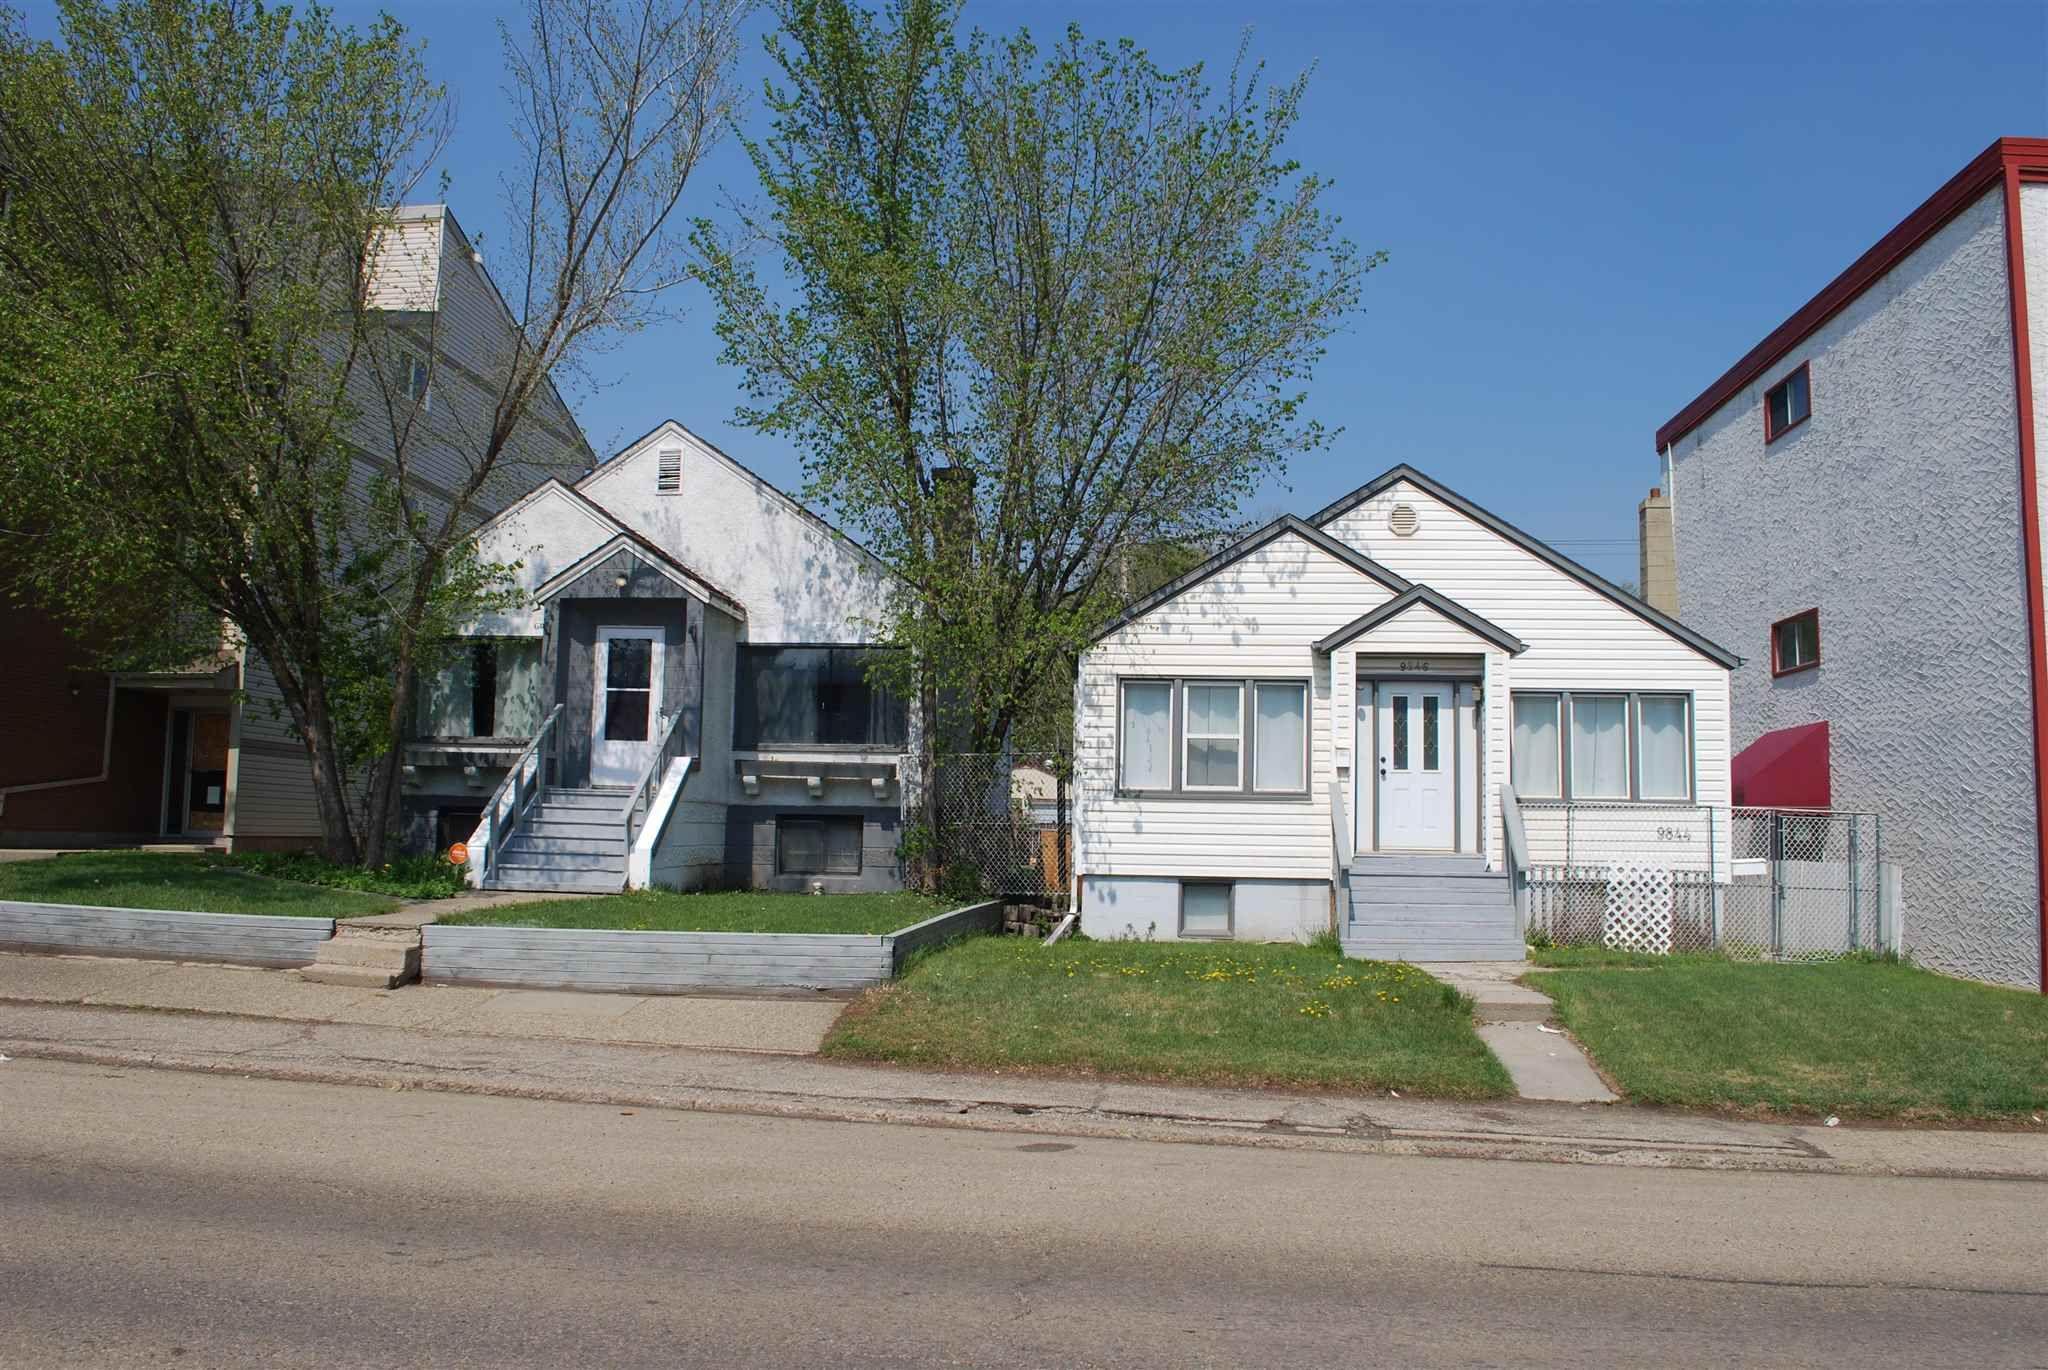 Main Photo: 9850 82 Avenue in Edmonton: Zone 15 House for sale : MLS®# E4243564